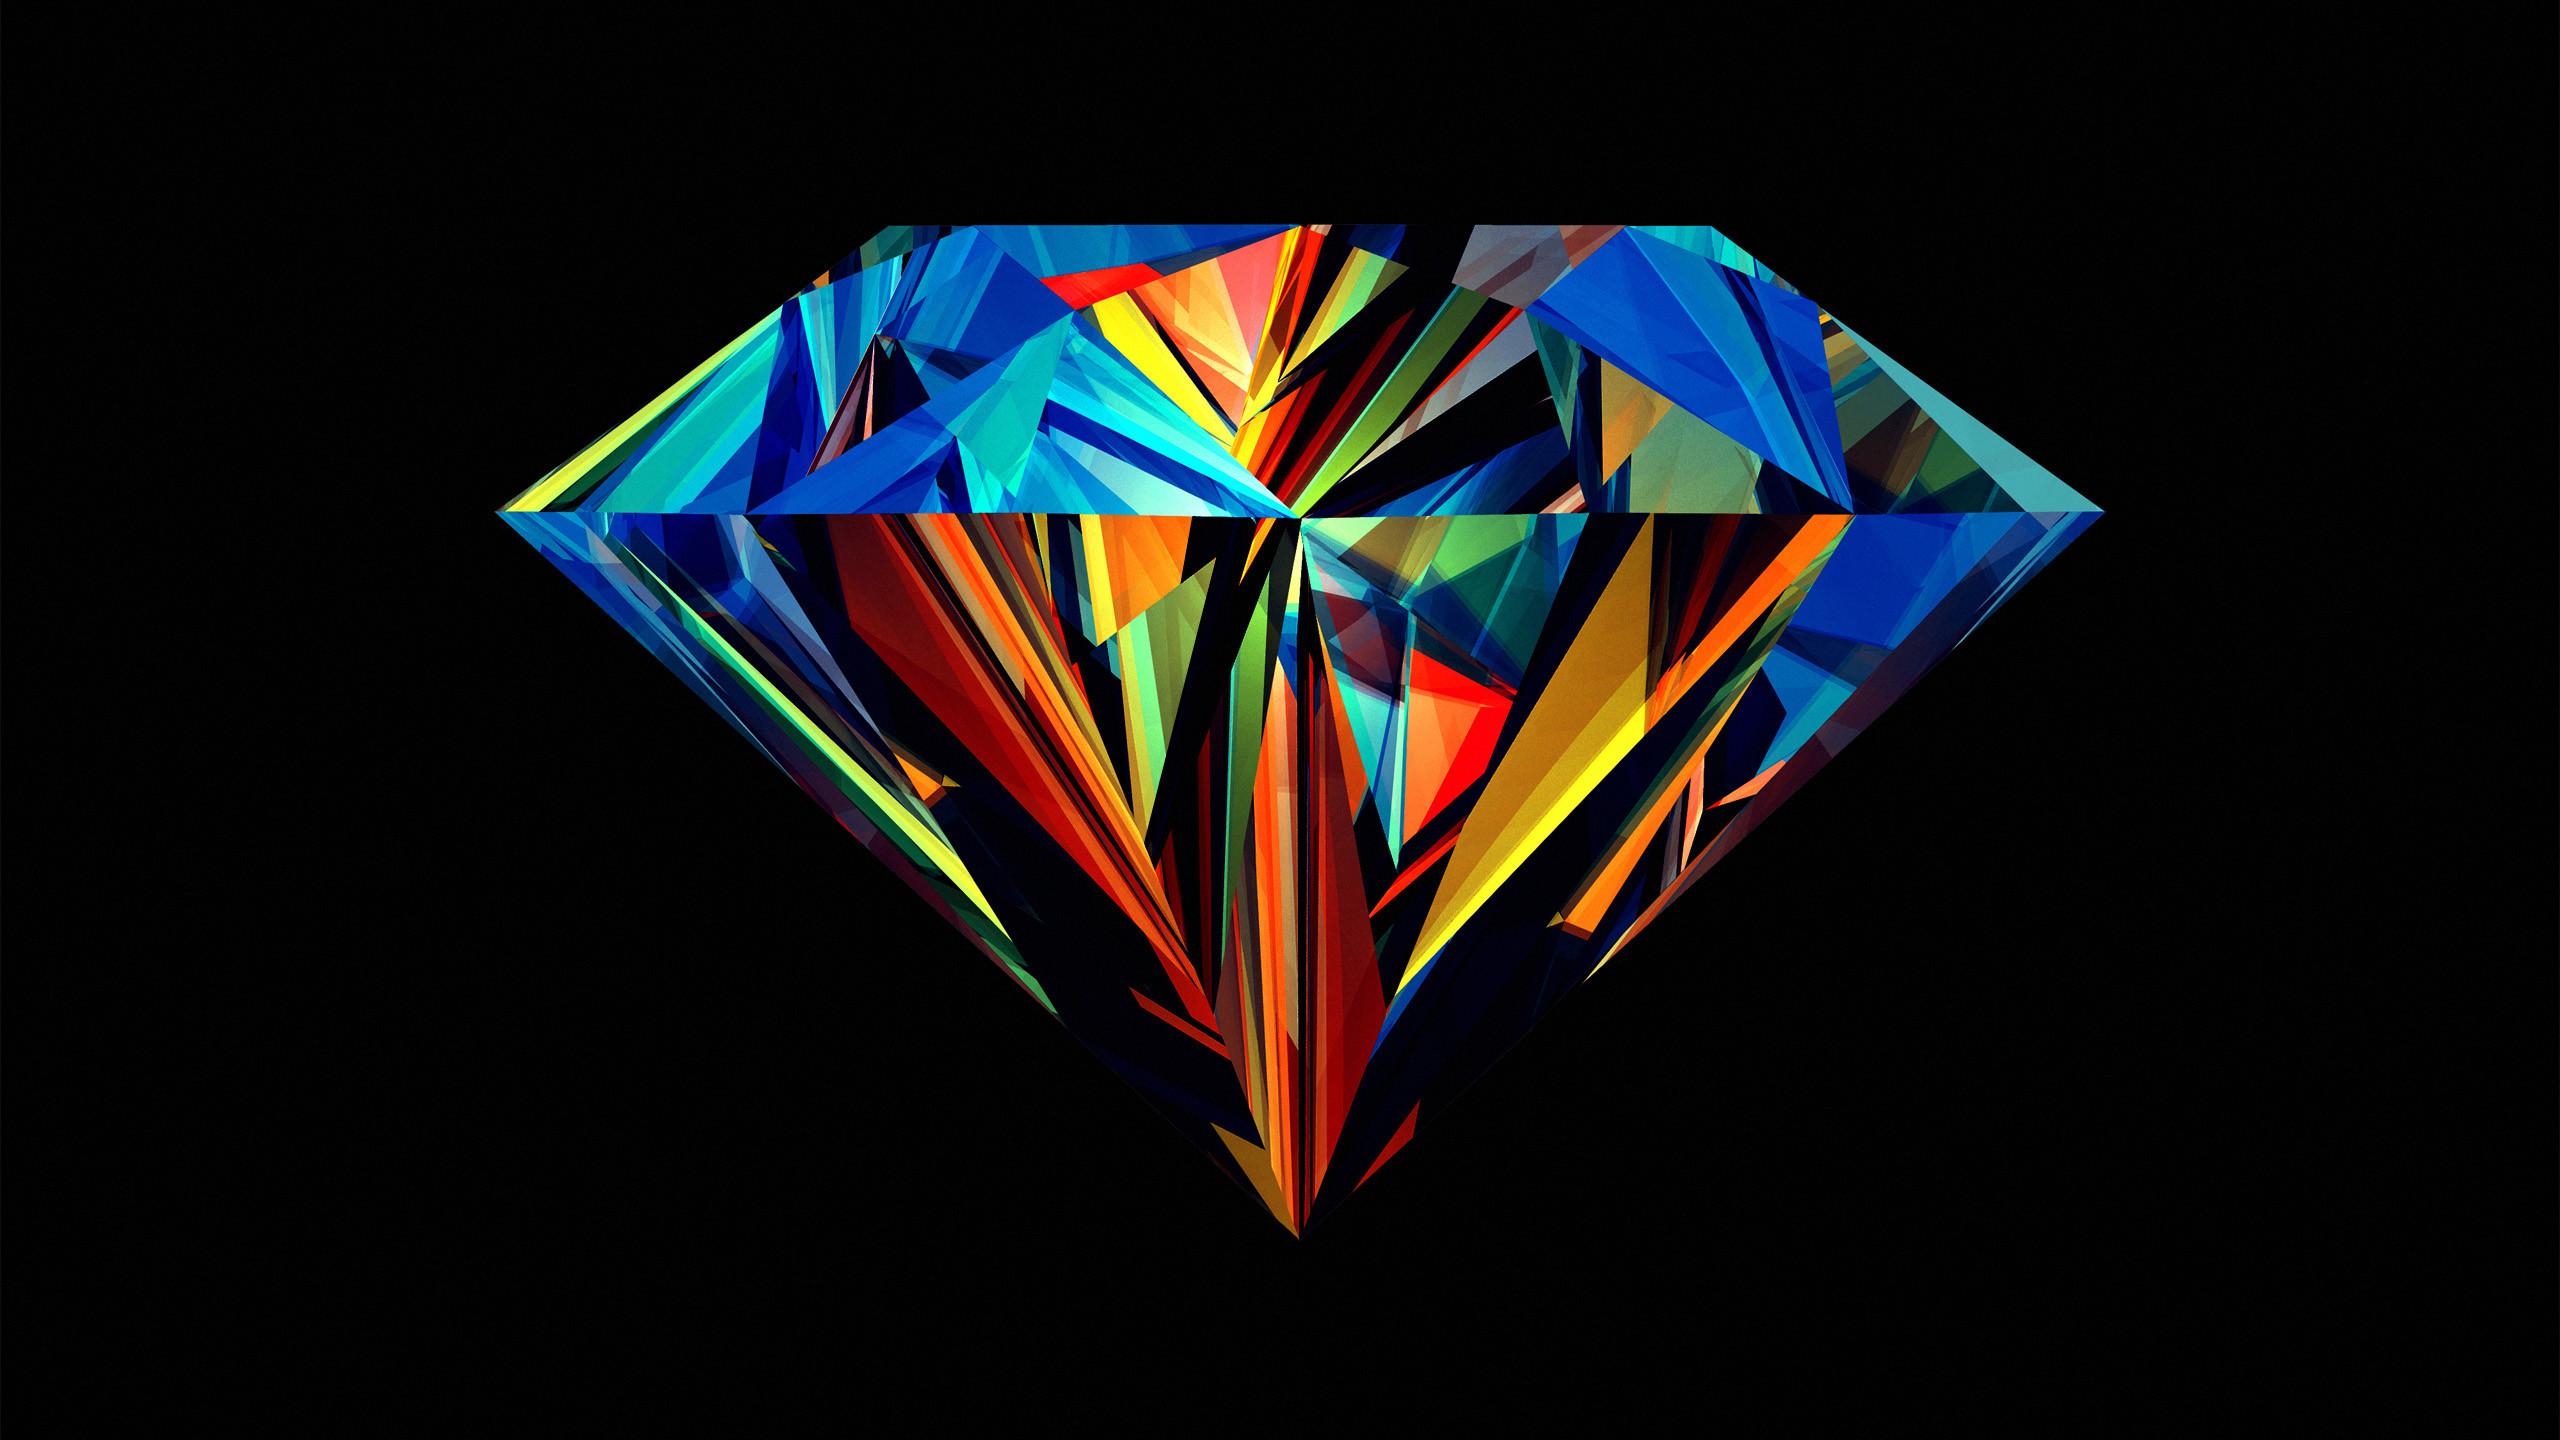 Cool diamond wallpaper I found …